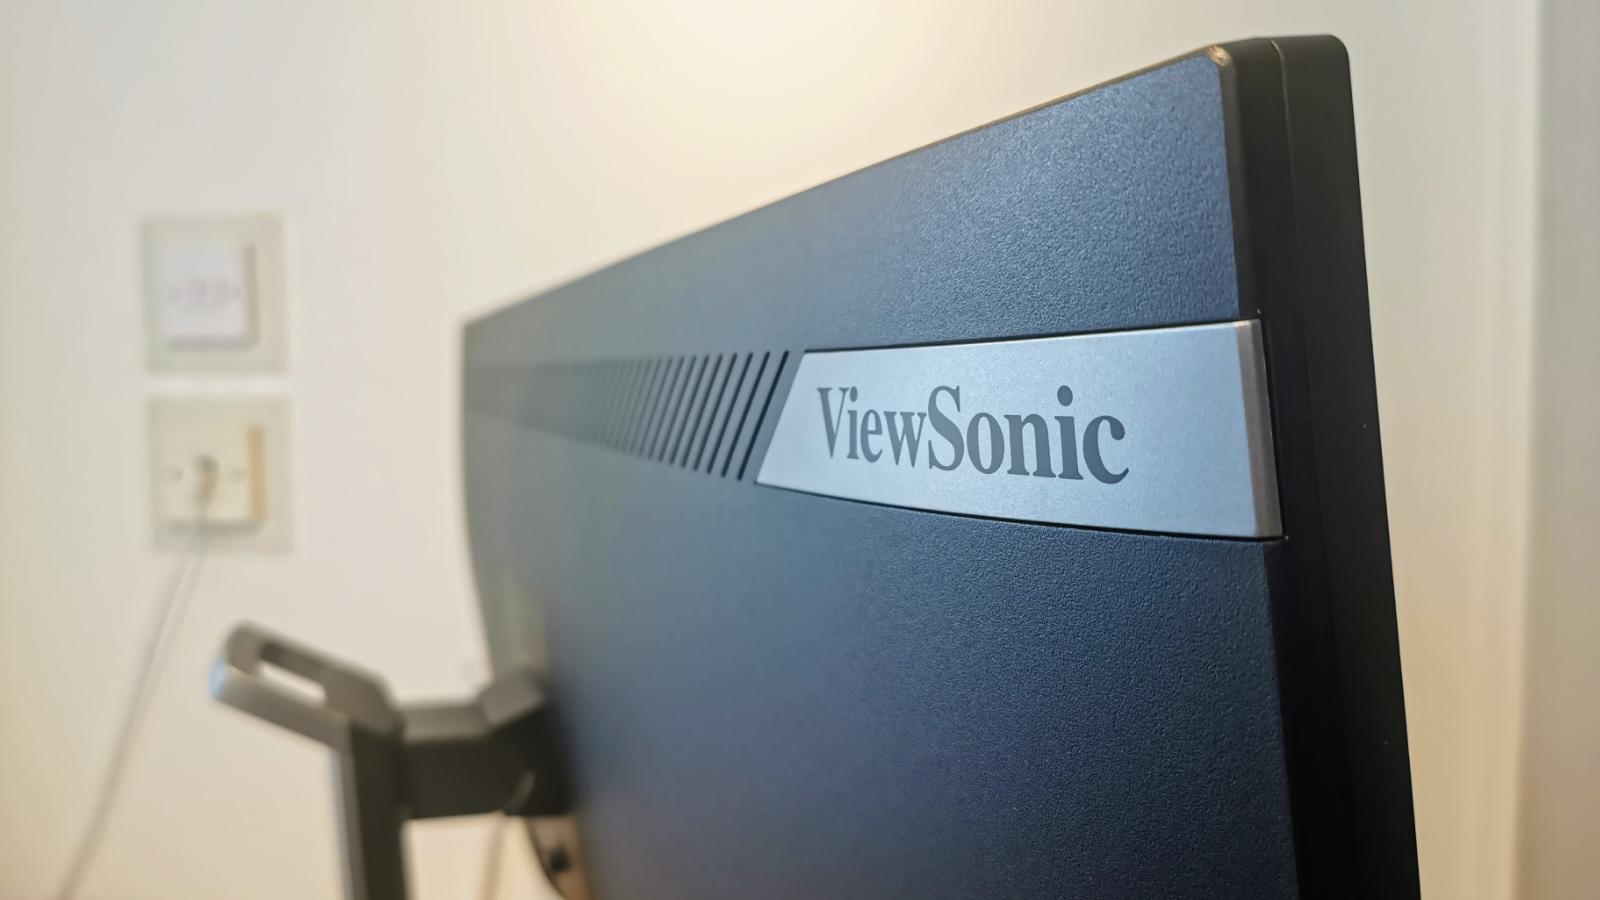 ViewSonic VG3456 Docking Monitor